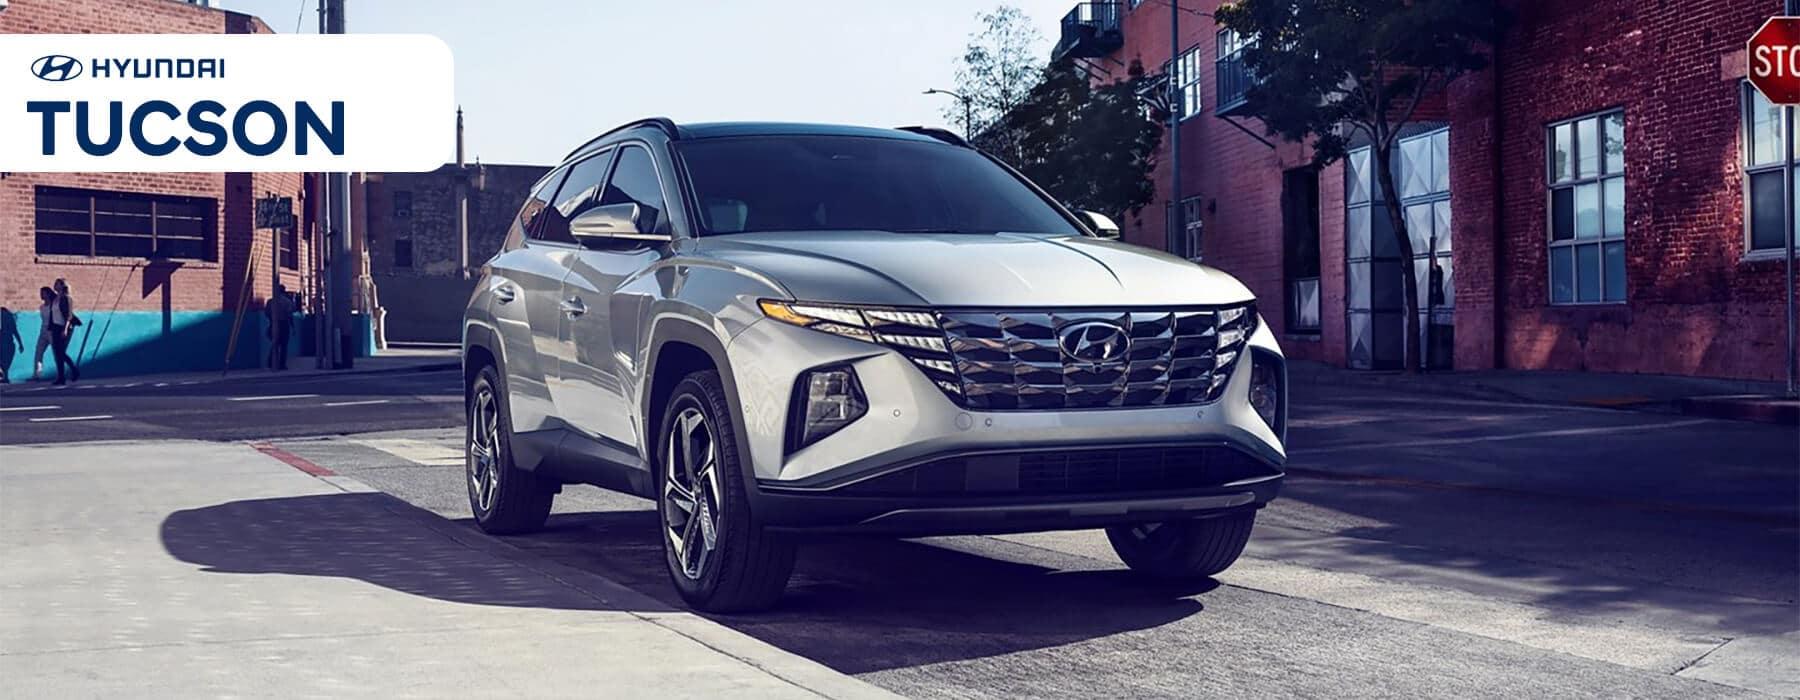 Hyundai SUV Lineup: 2022 Tucson Slider